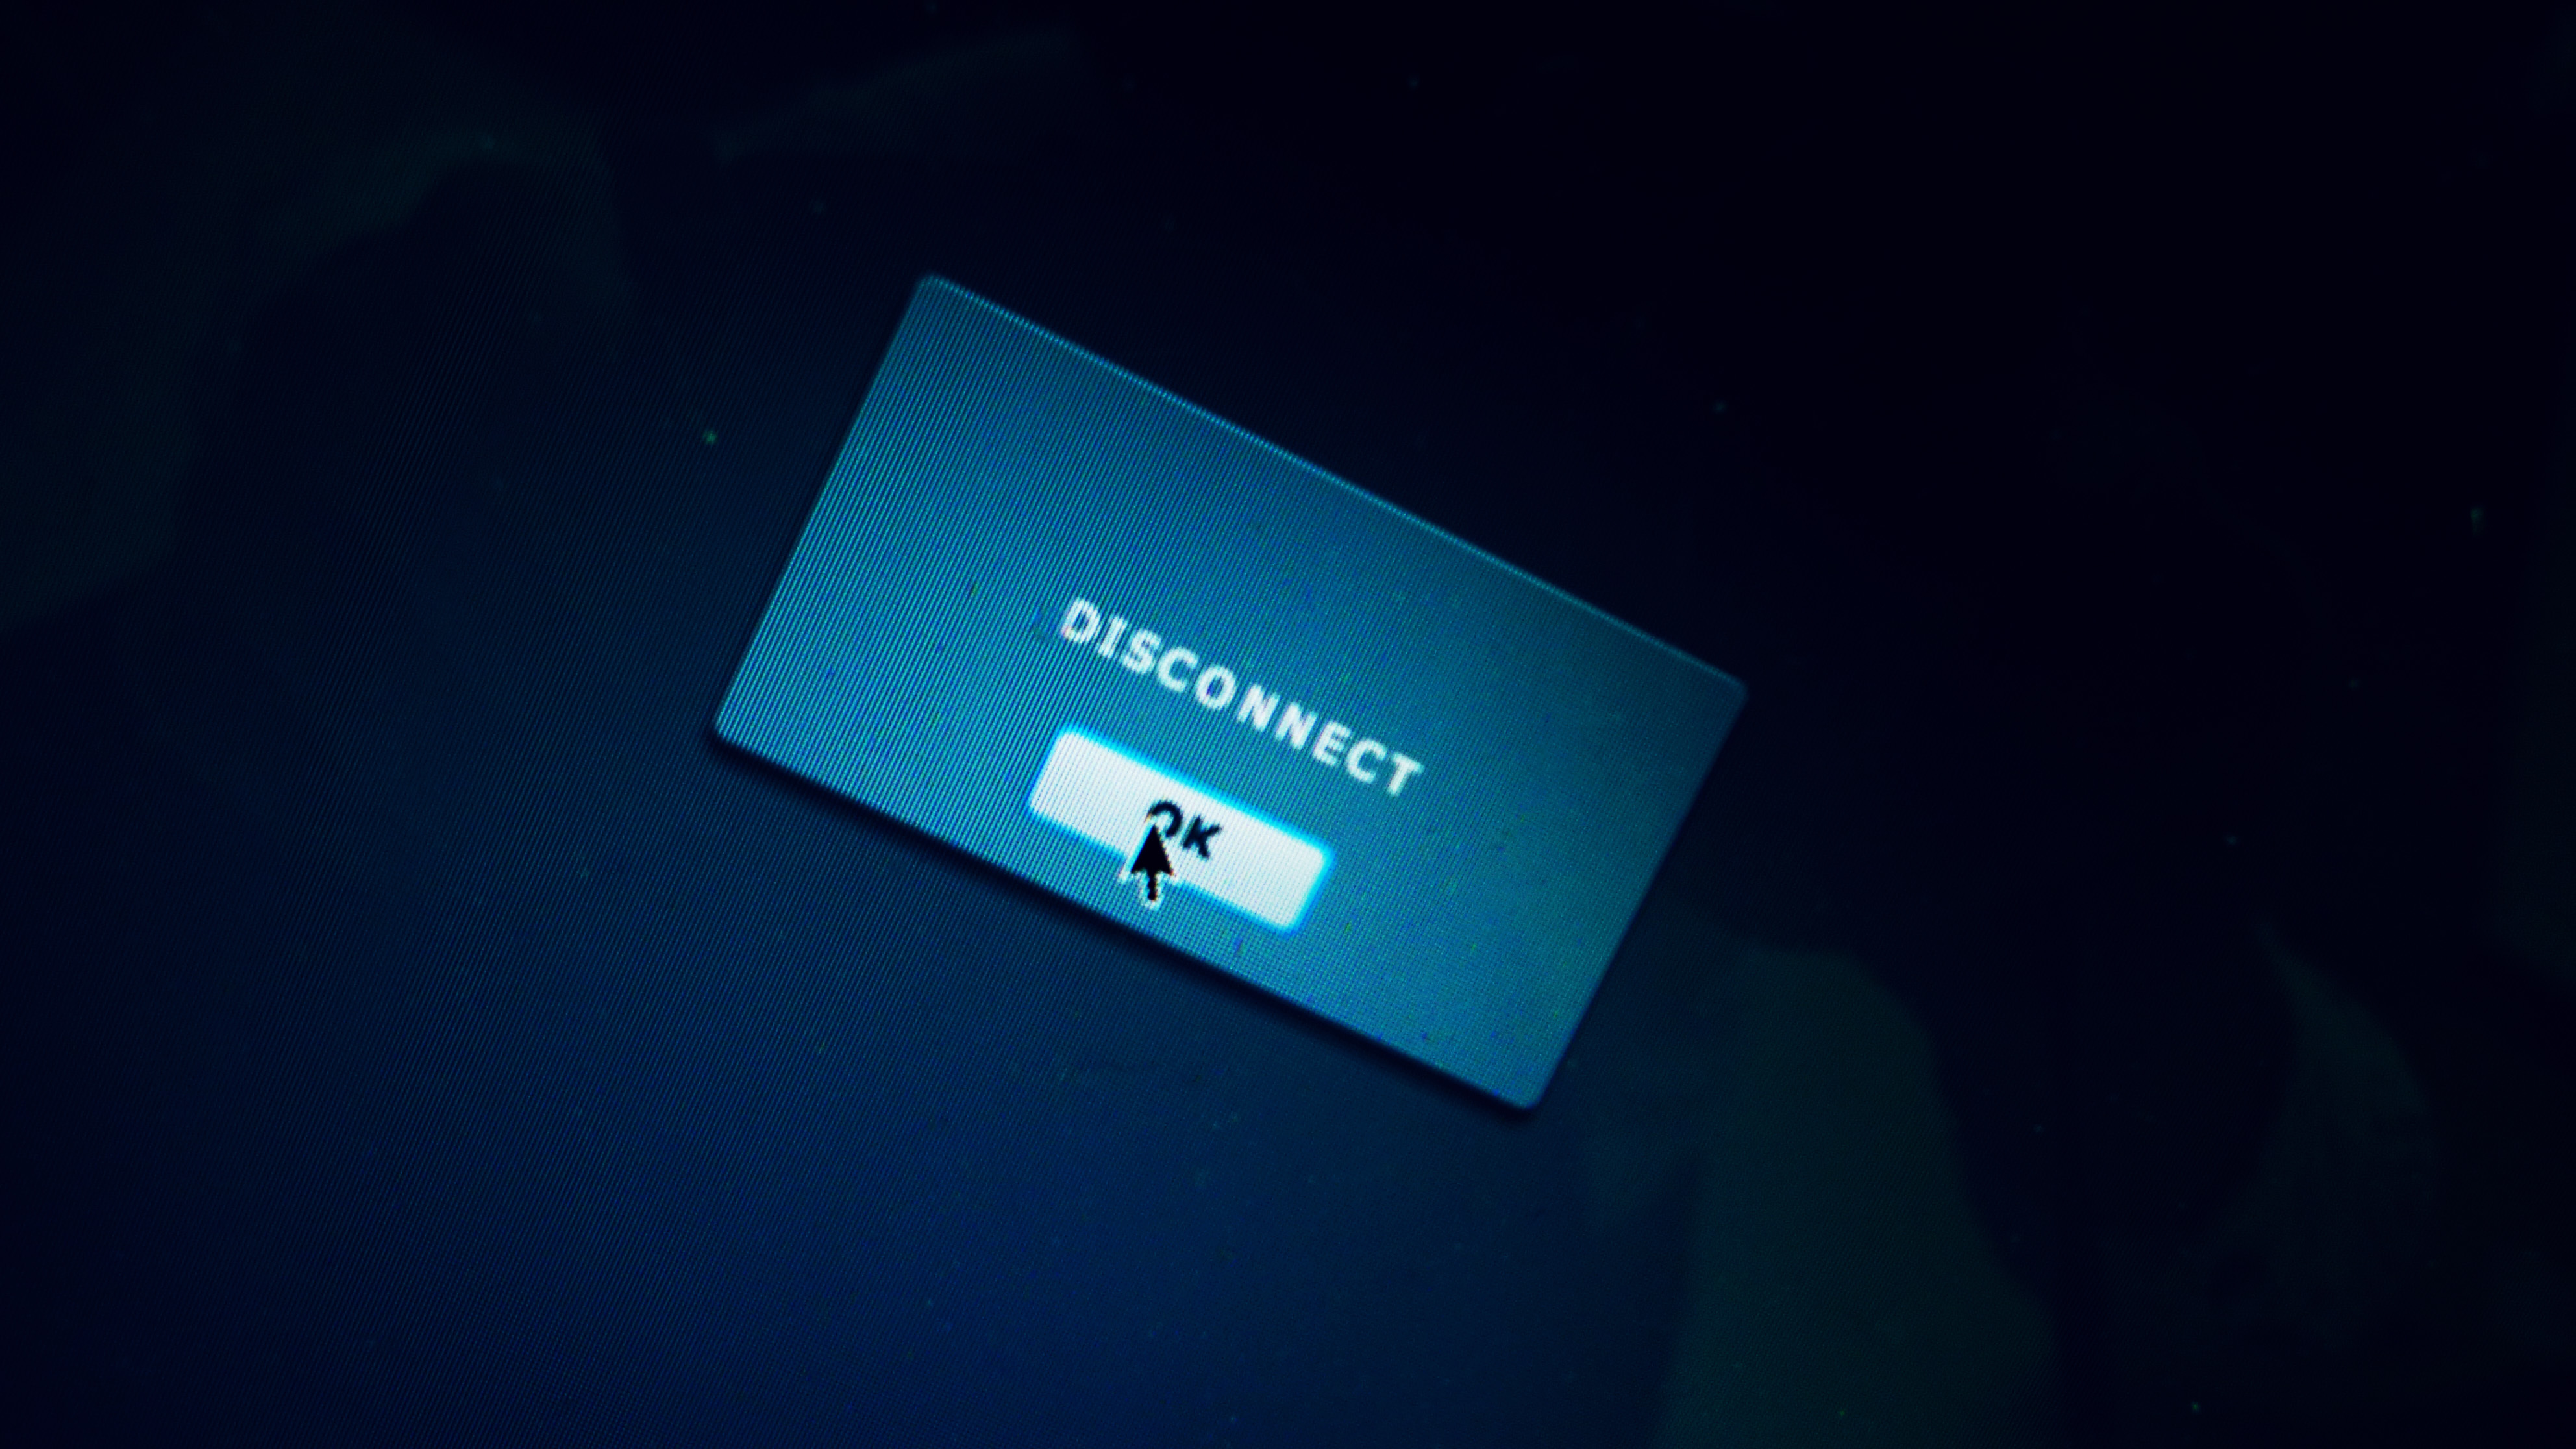 Disconnected. PHOTO CREDIT: Tomaž Štolfa/ Flickr